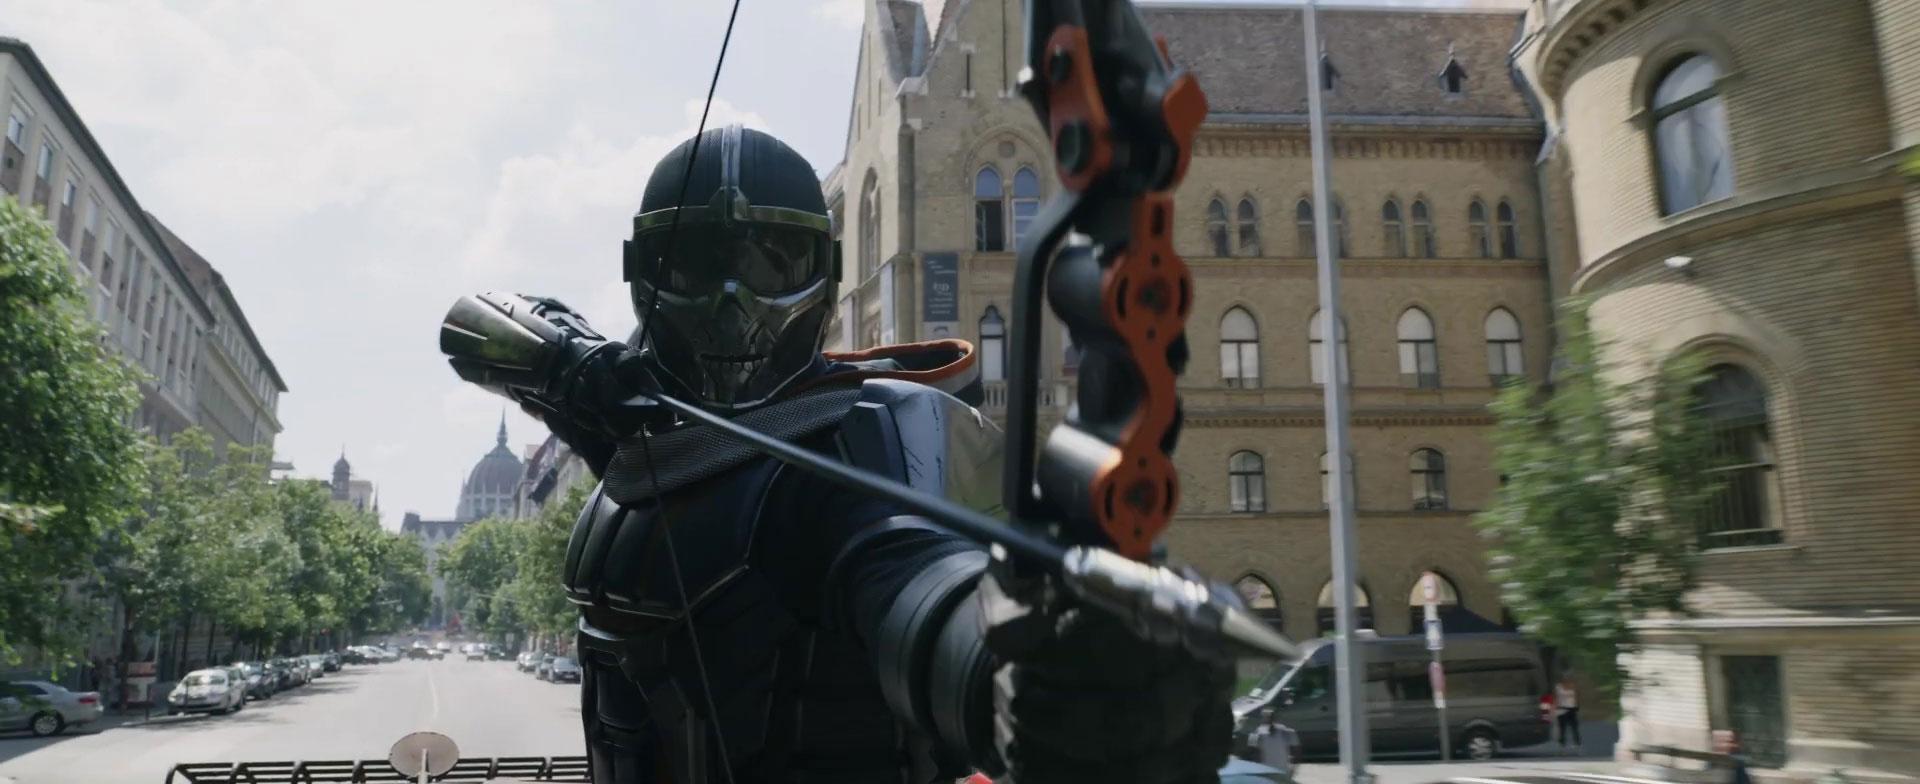 capture black widow disney marvel